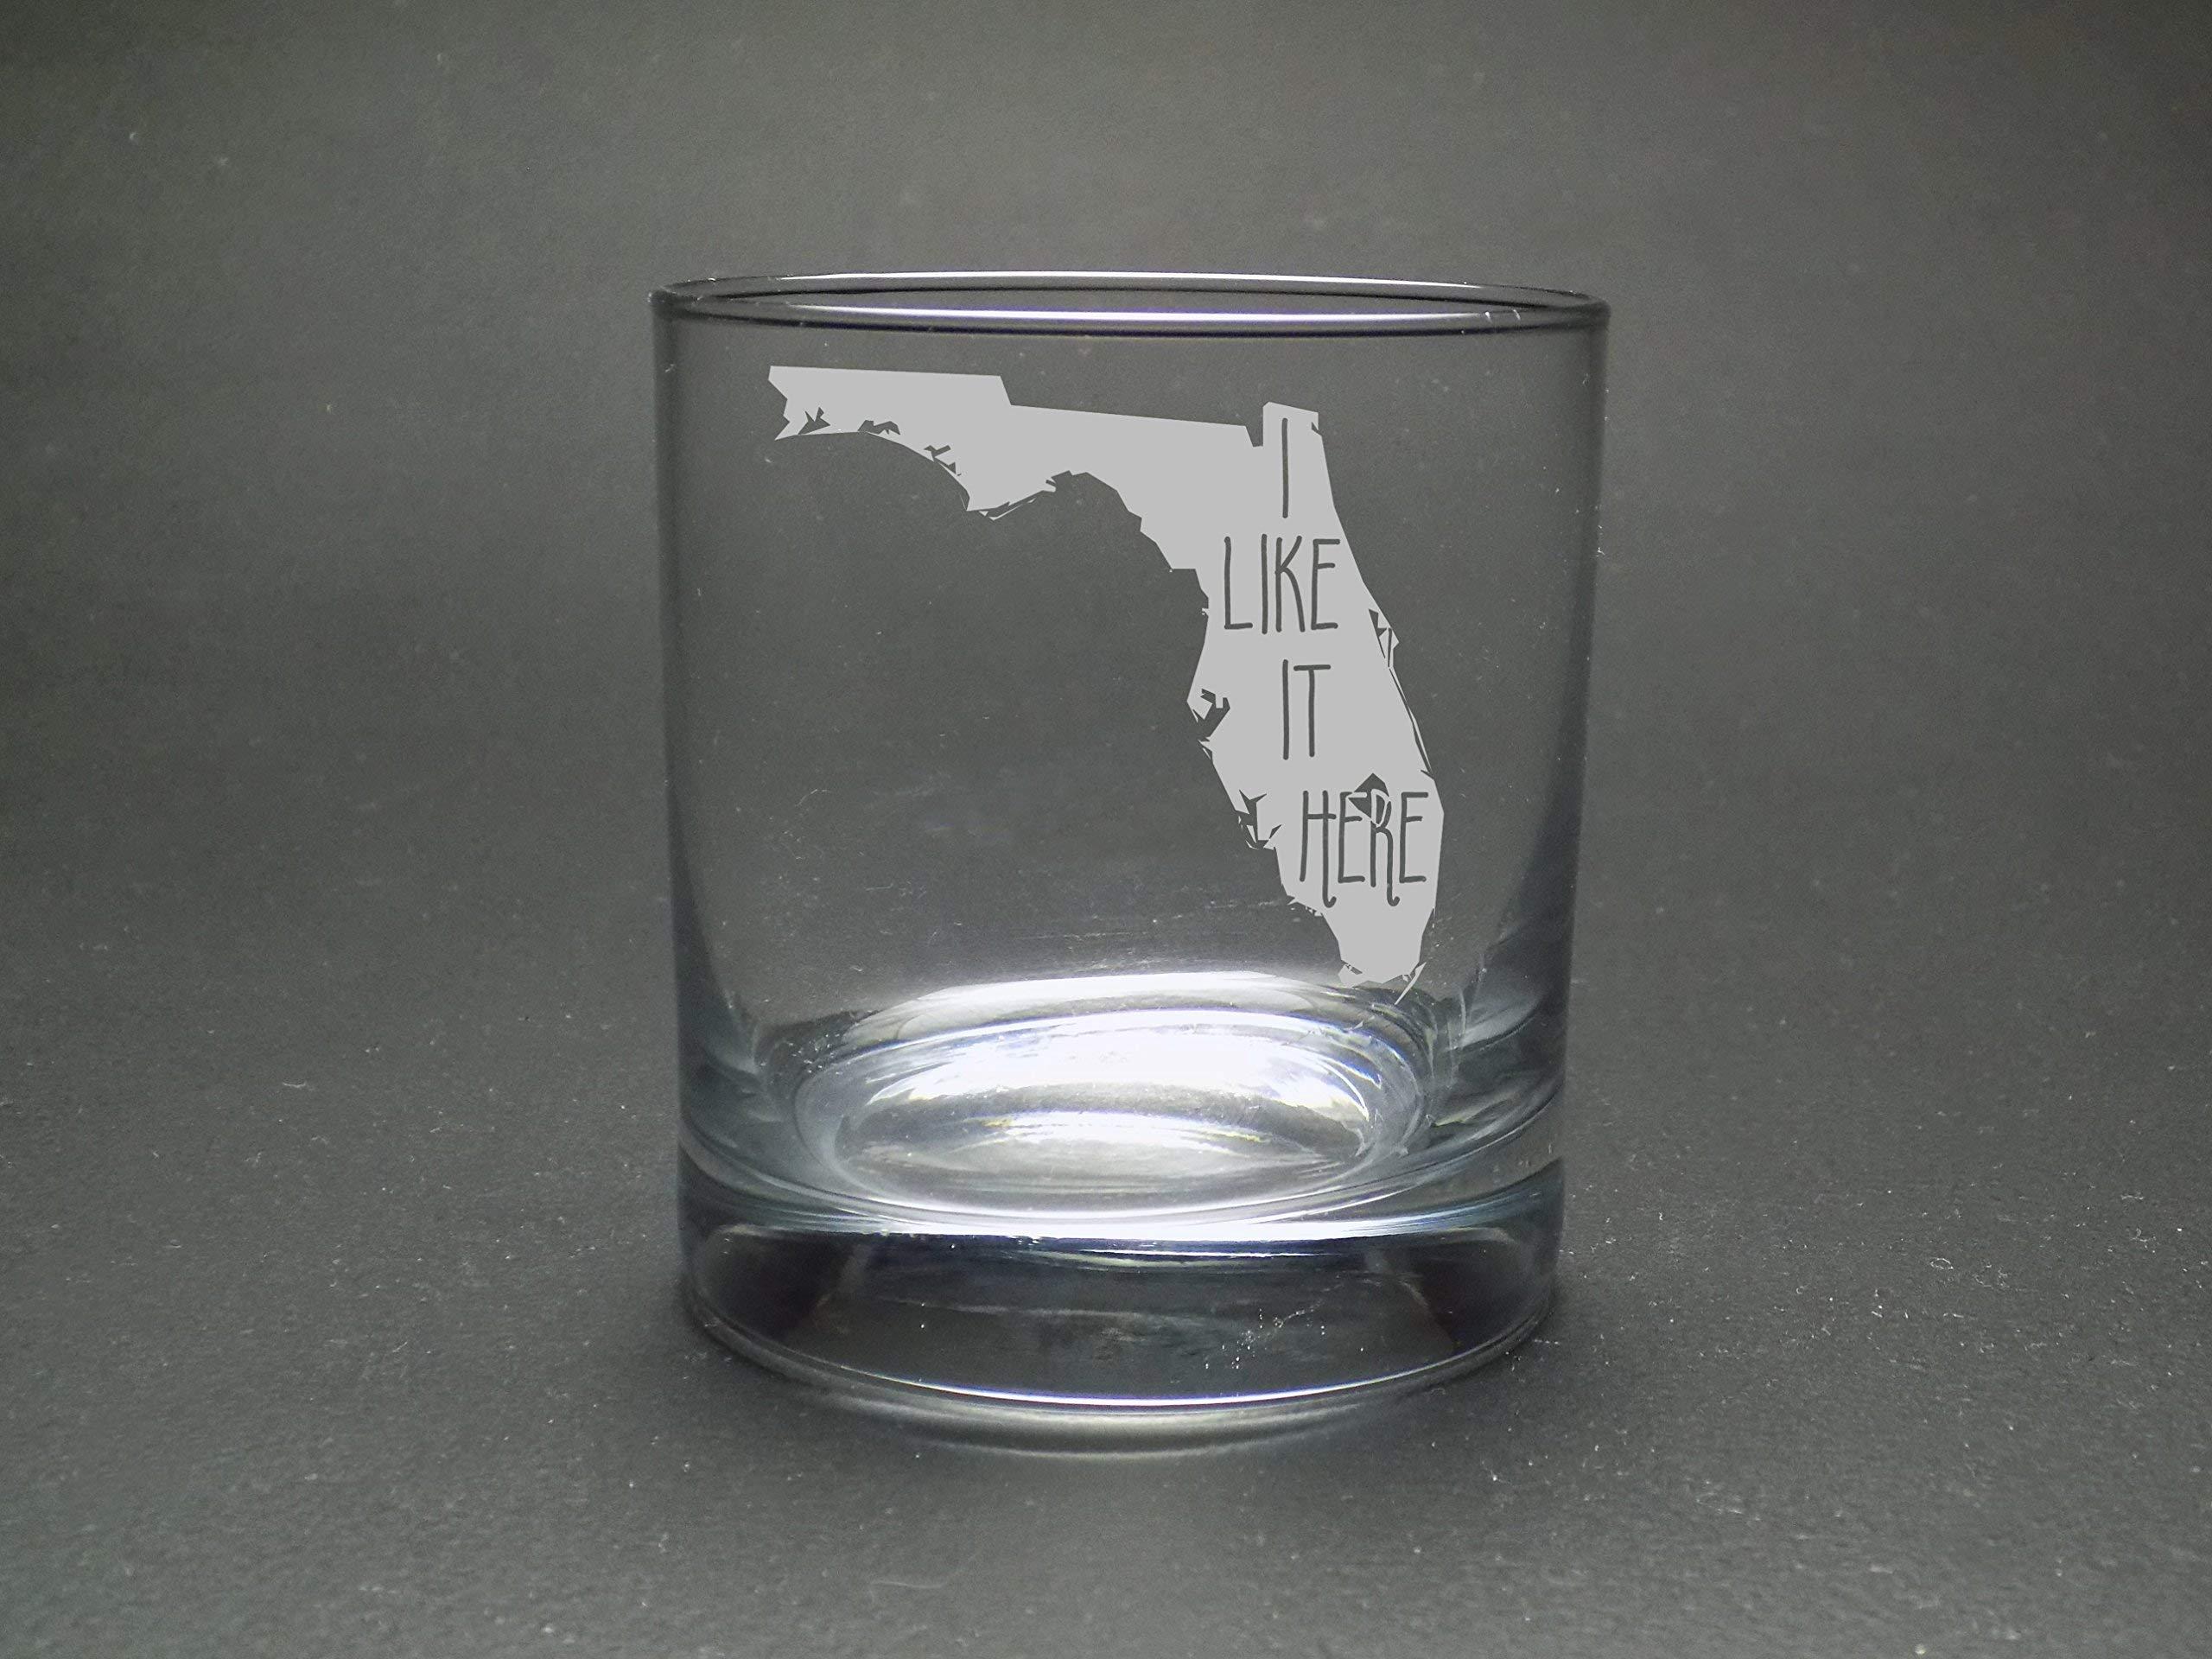 Florida I Like It Here Rocks Glass - Home Rocks Glass - Moving Gift - Housewarming Gift - Graduation Gift - Florida Rocks Glass